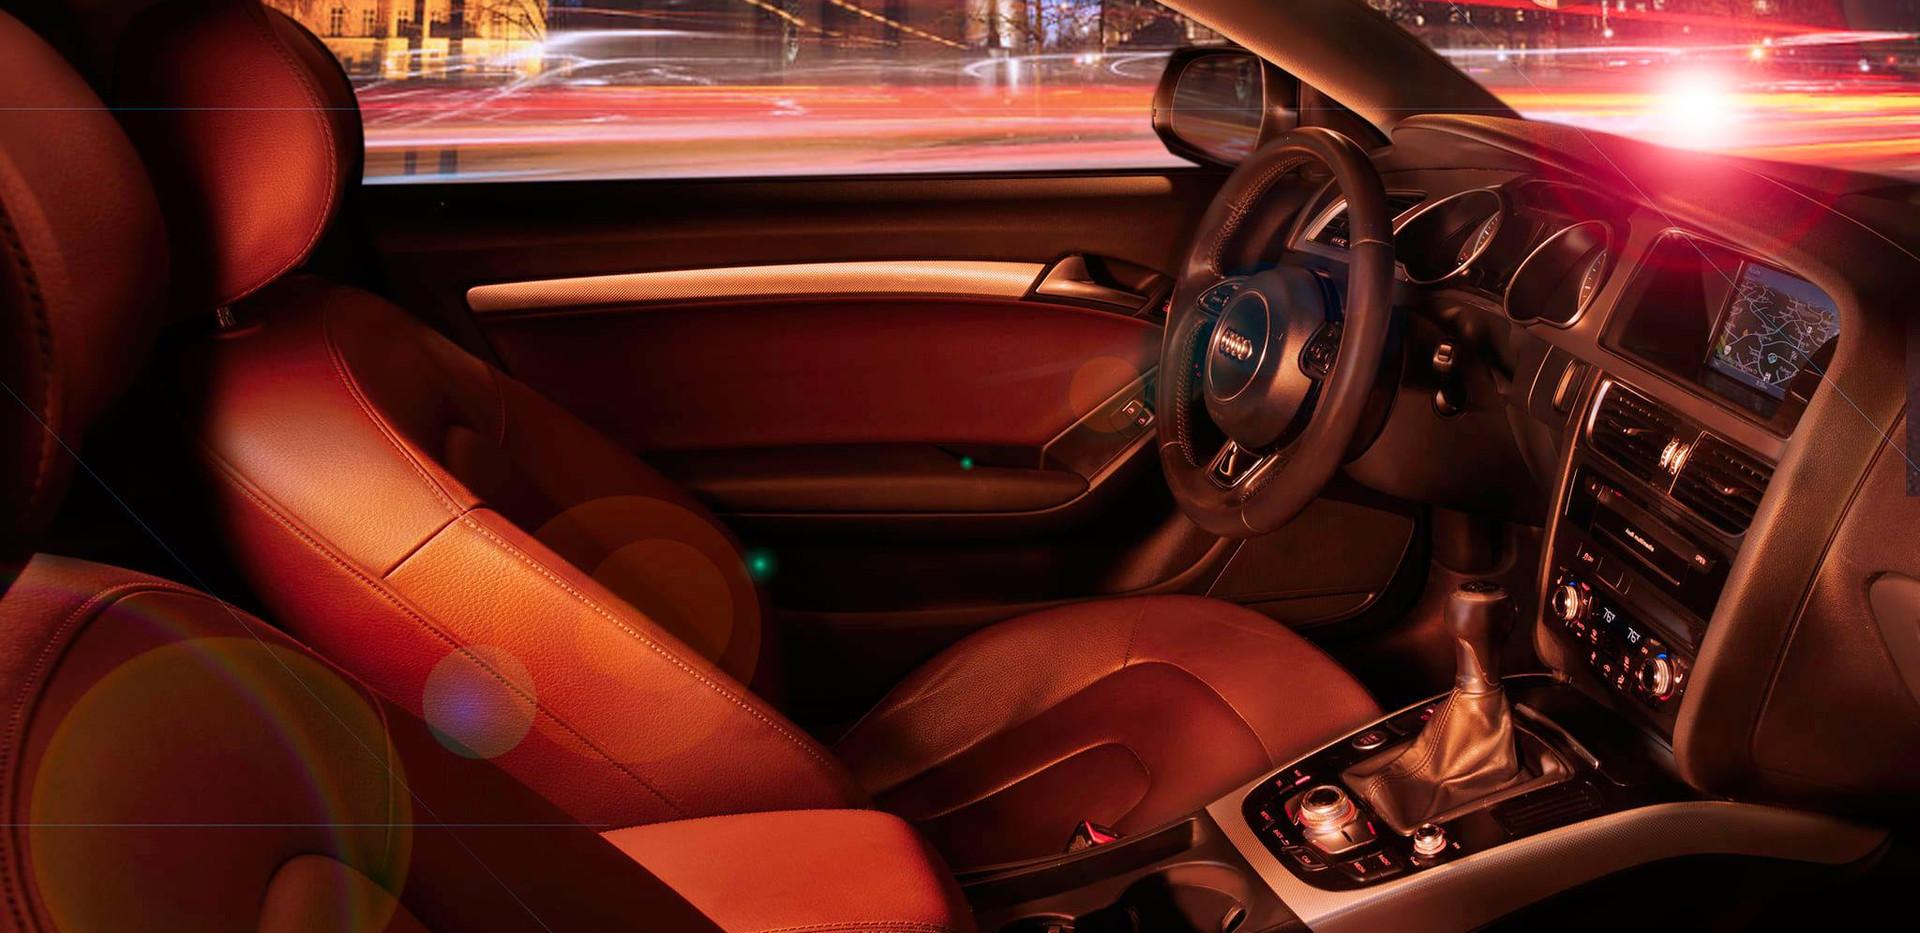 LightPainted Audi.jpg